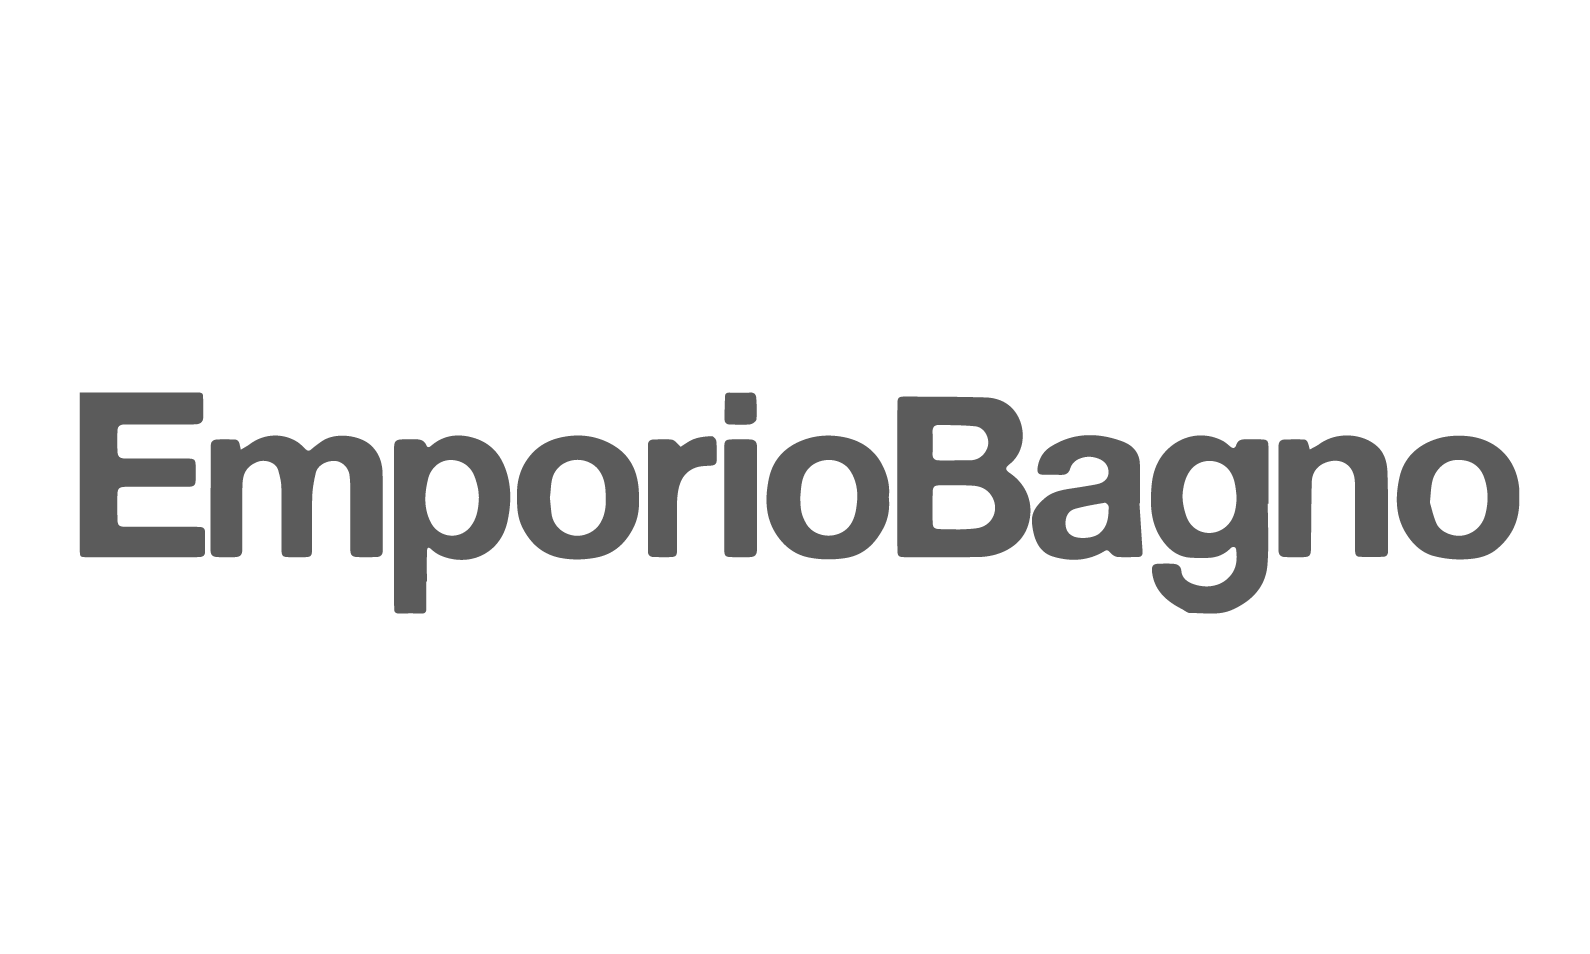 emporio bagno grey logo